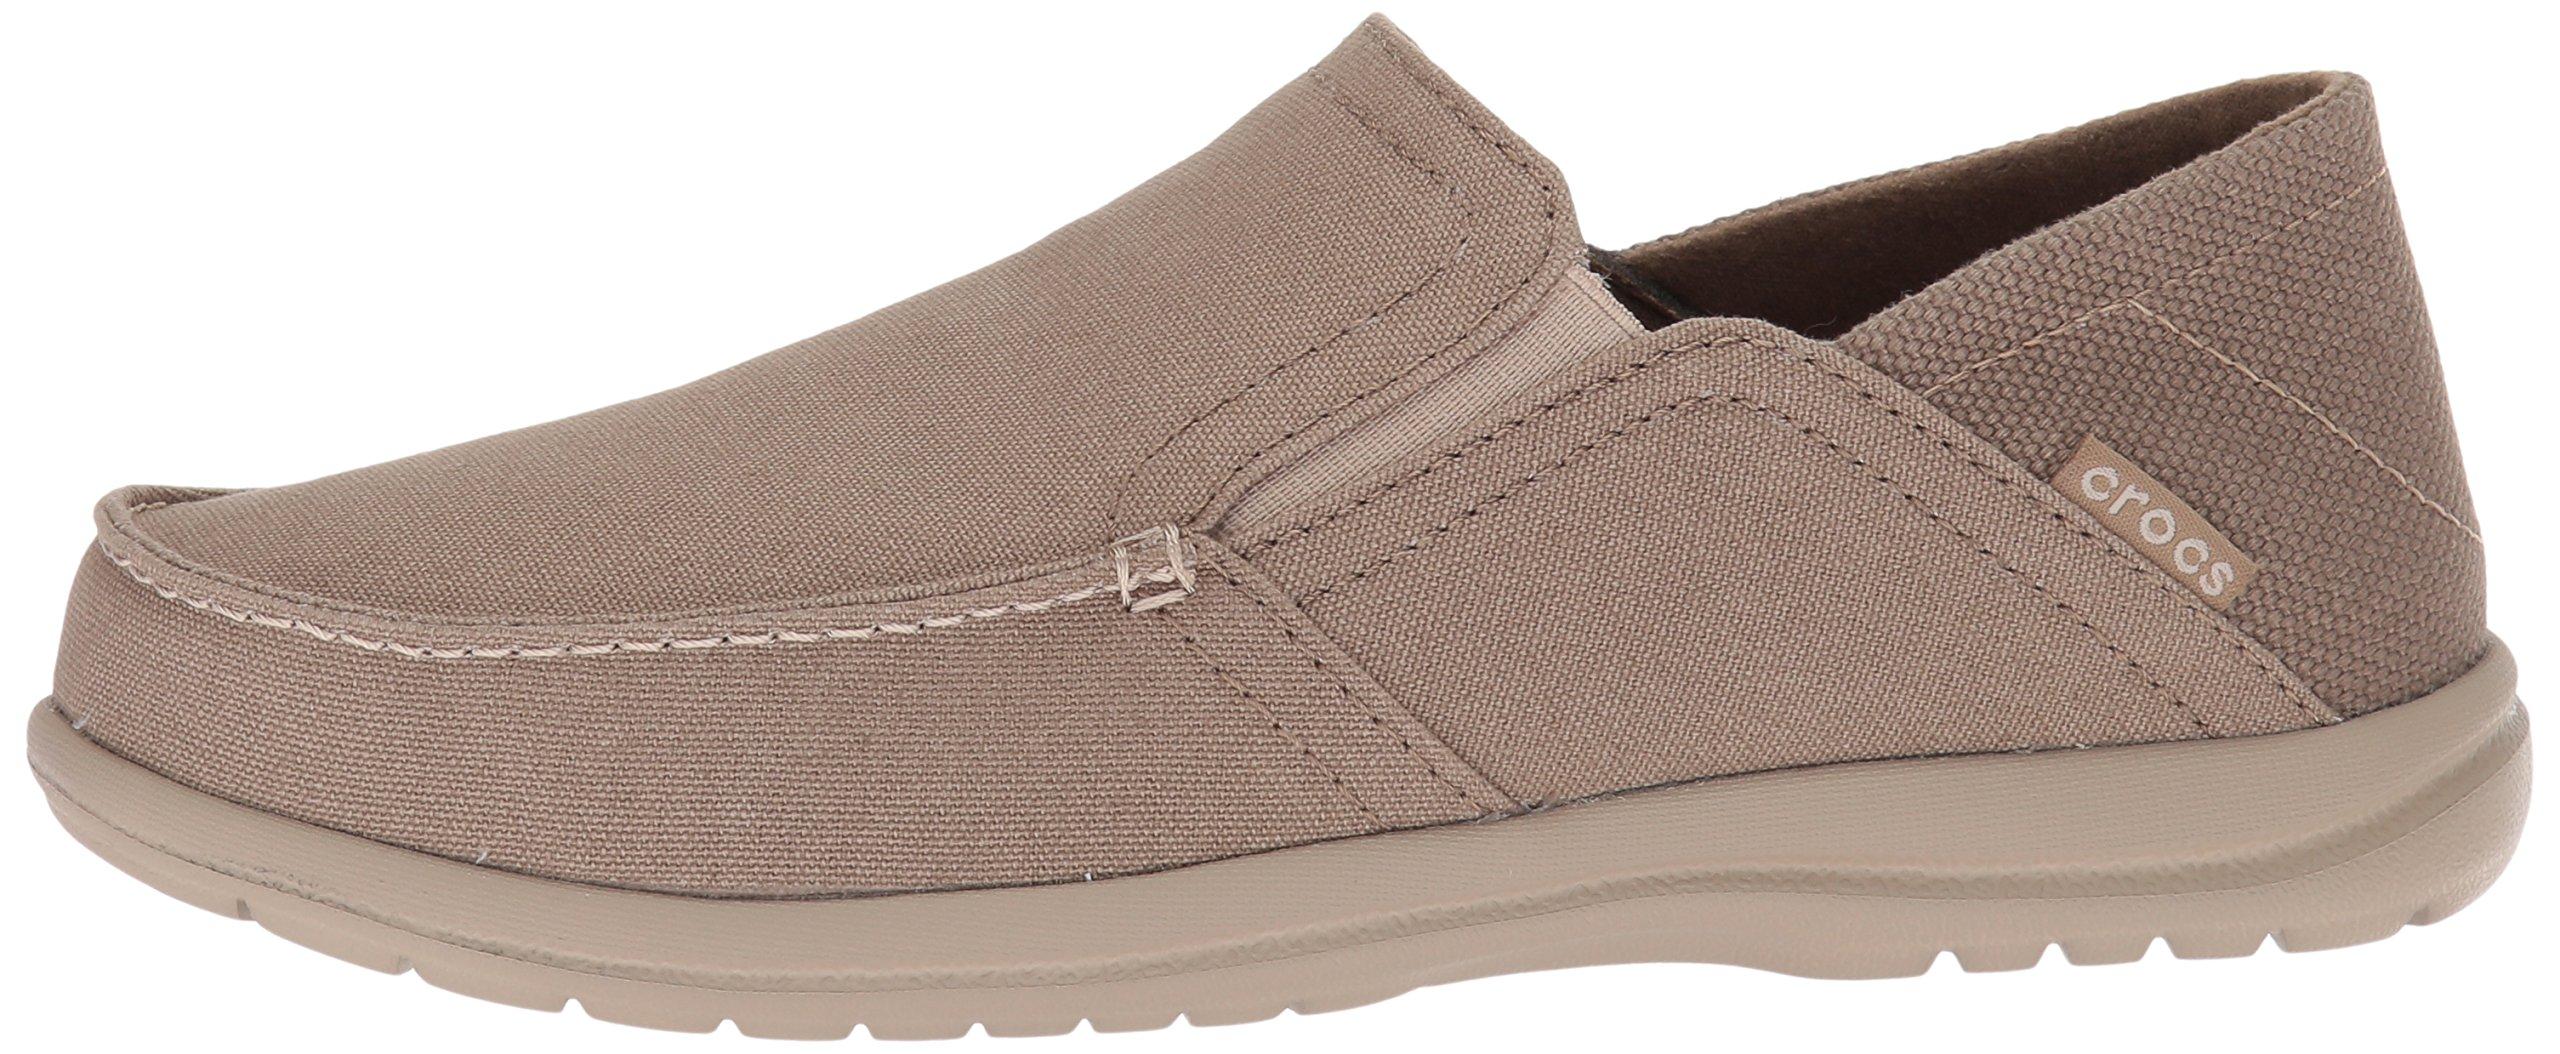 f61f6fb1d749 Crocs Men s Santa Cruz Convertible Slip-On Loafer